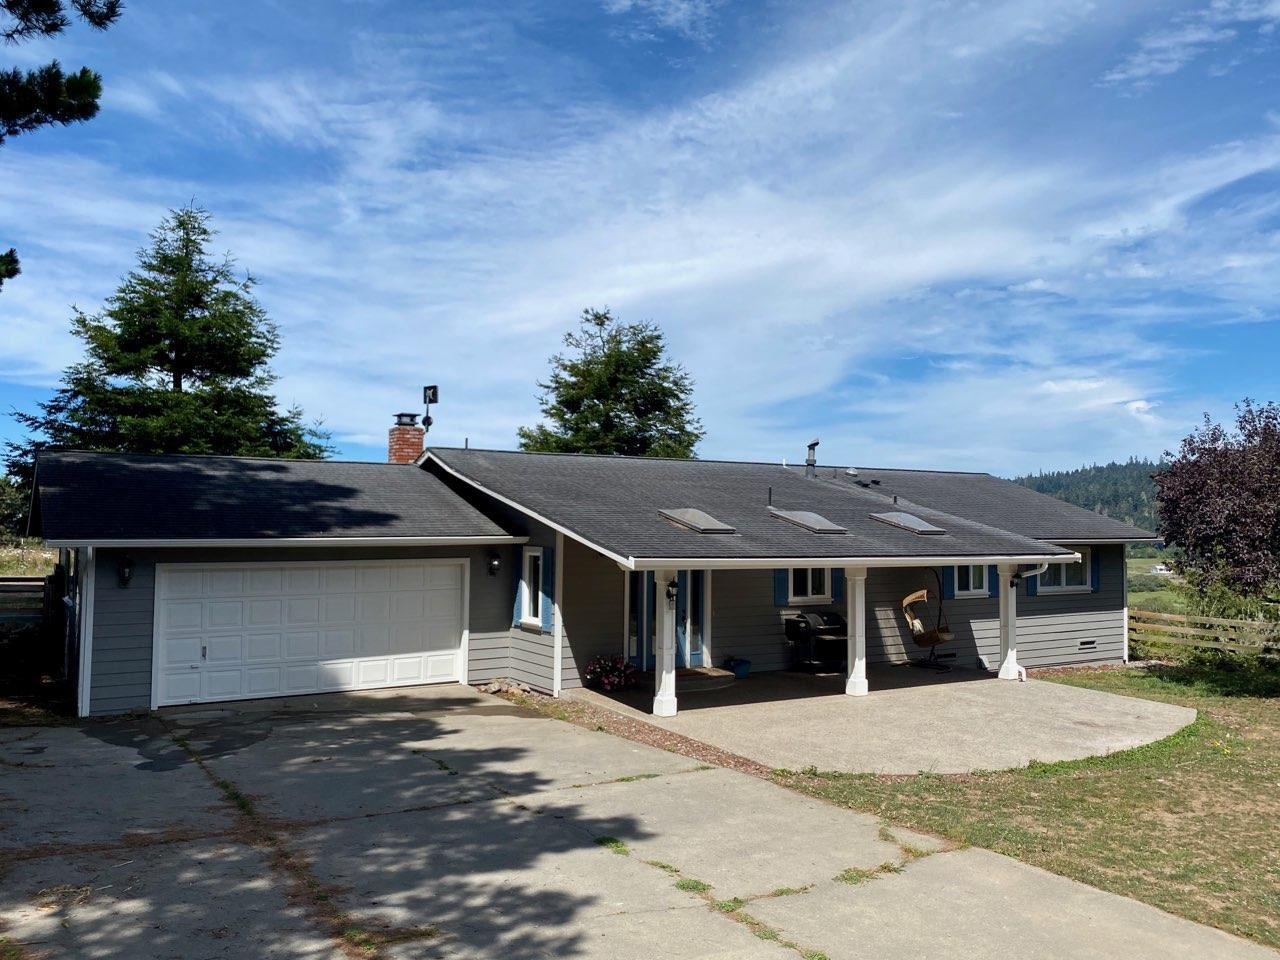 525 Hookton Cemetary Road, Loleta, CA 95551 - MLS#: 257204